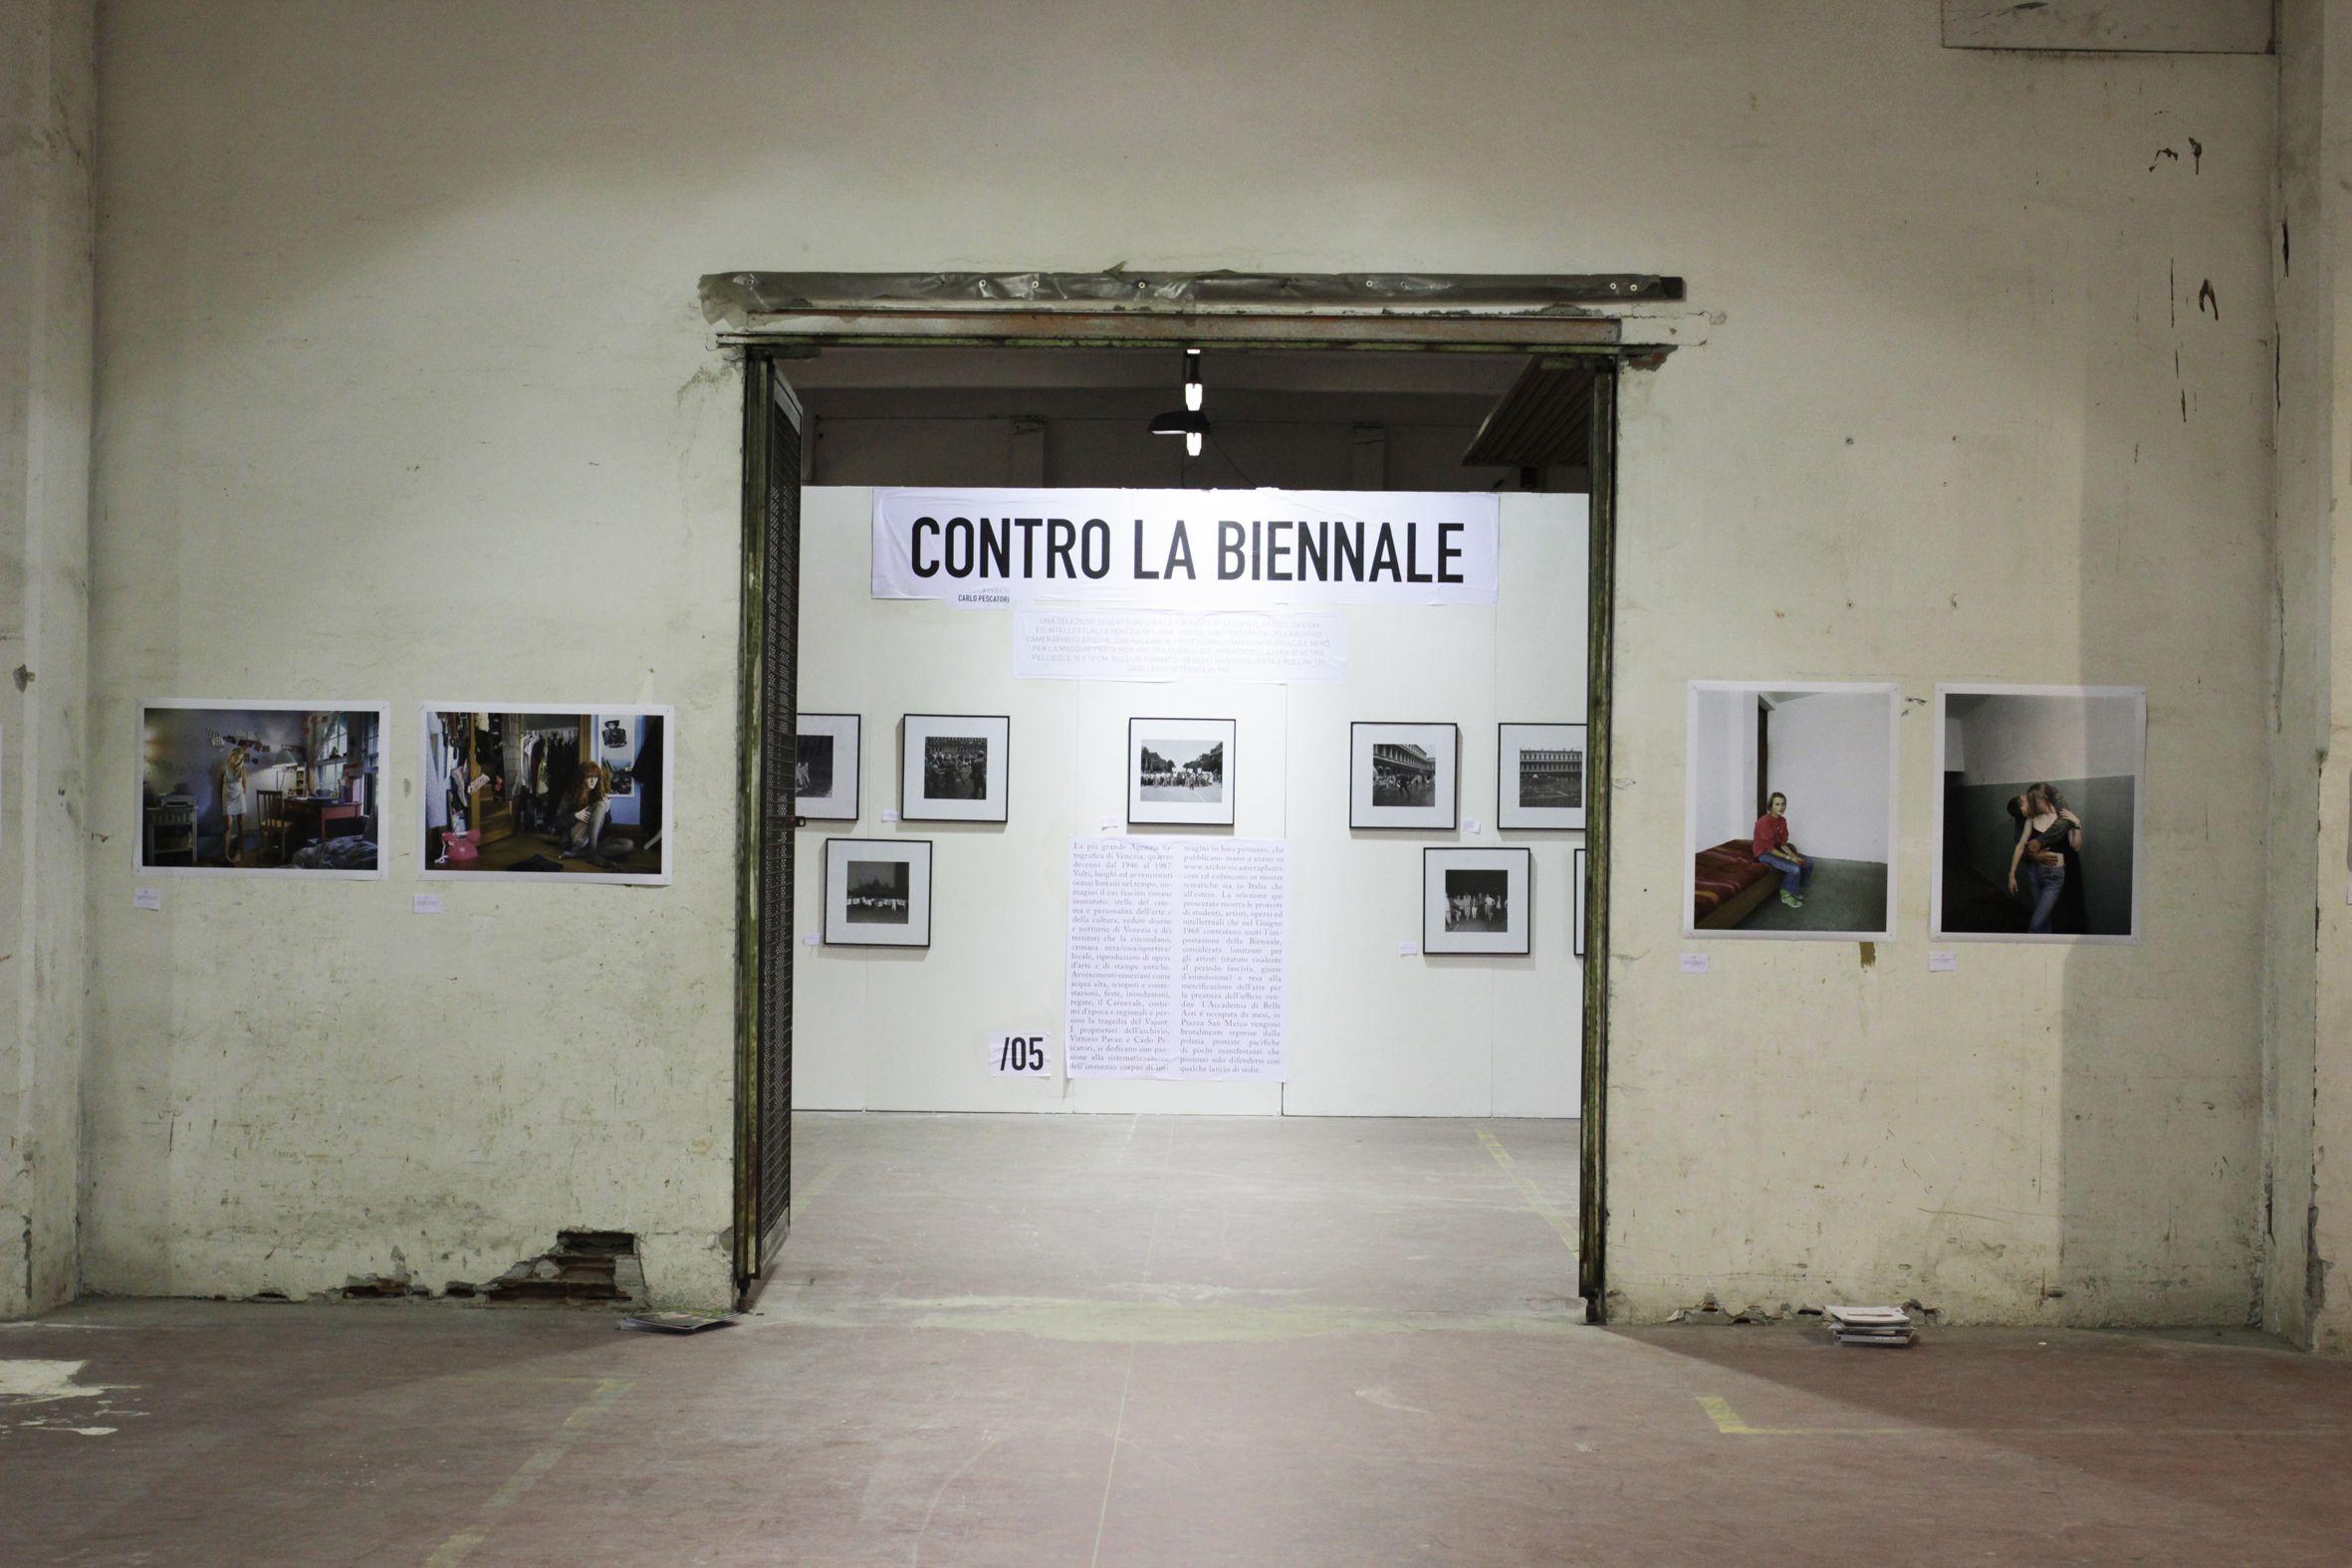 Photissima Festival, 2012, vedita allestimento, Ex Manifattura Tabacchi